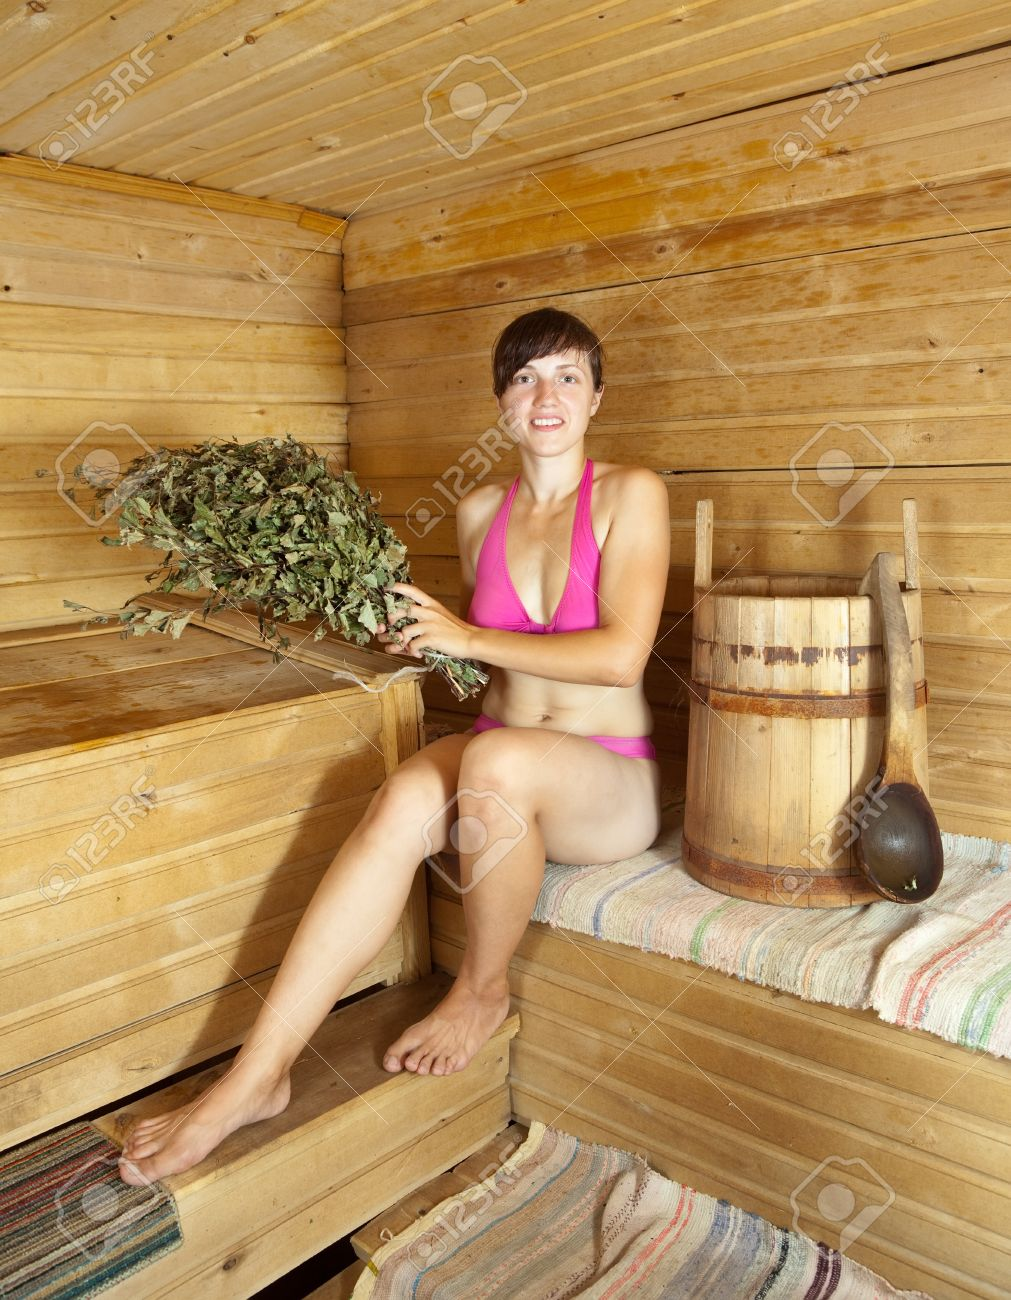 Фотографії девушек в бане 8 фотография